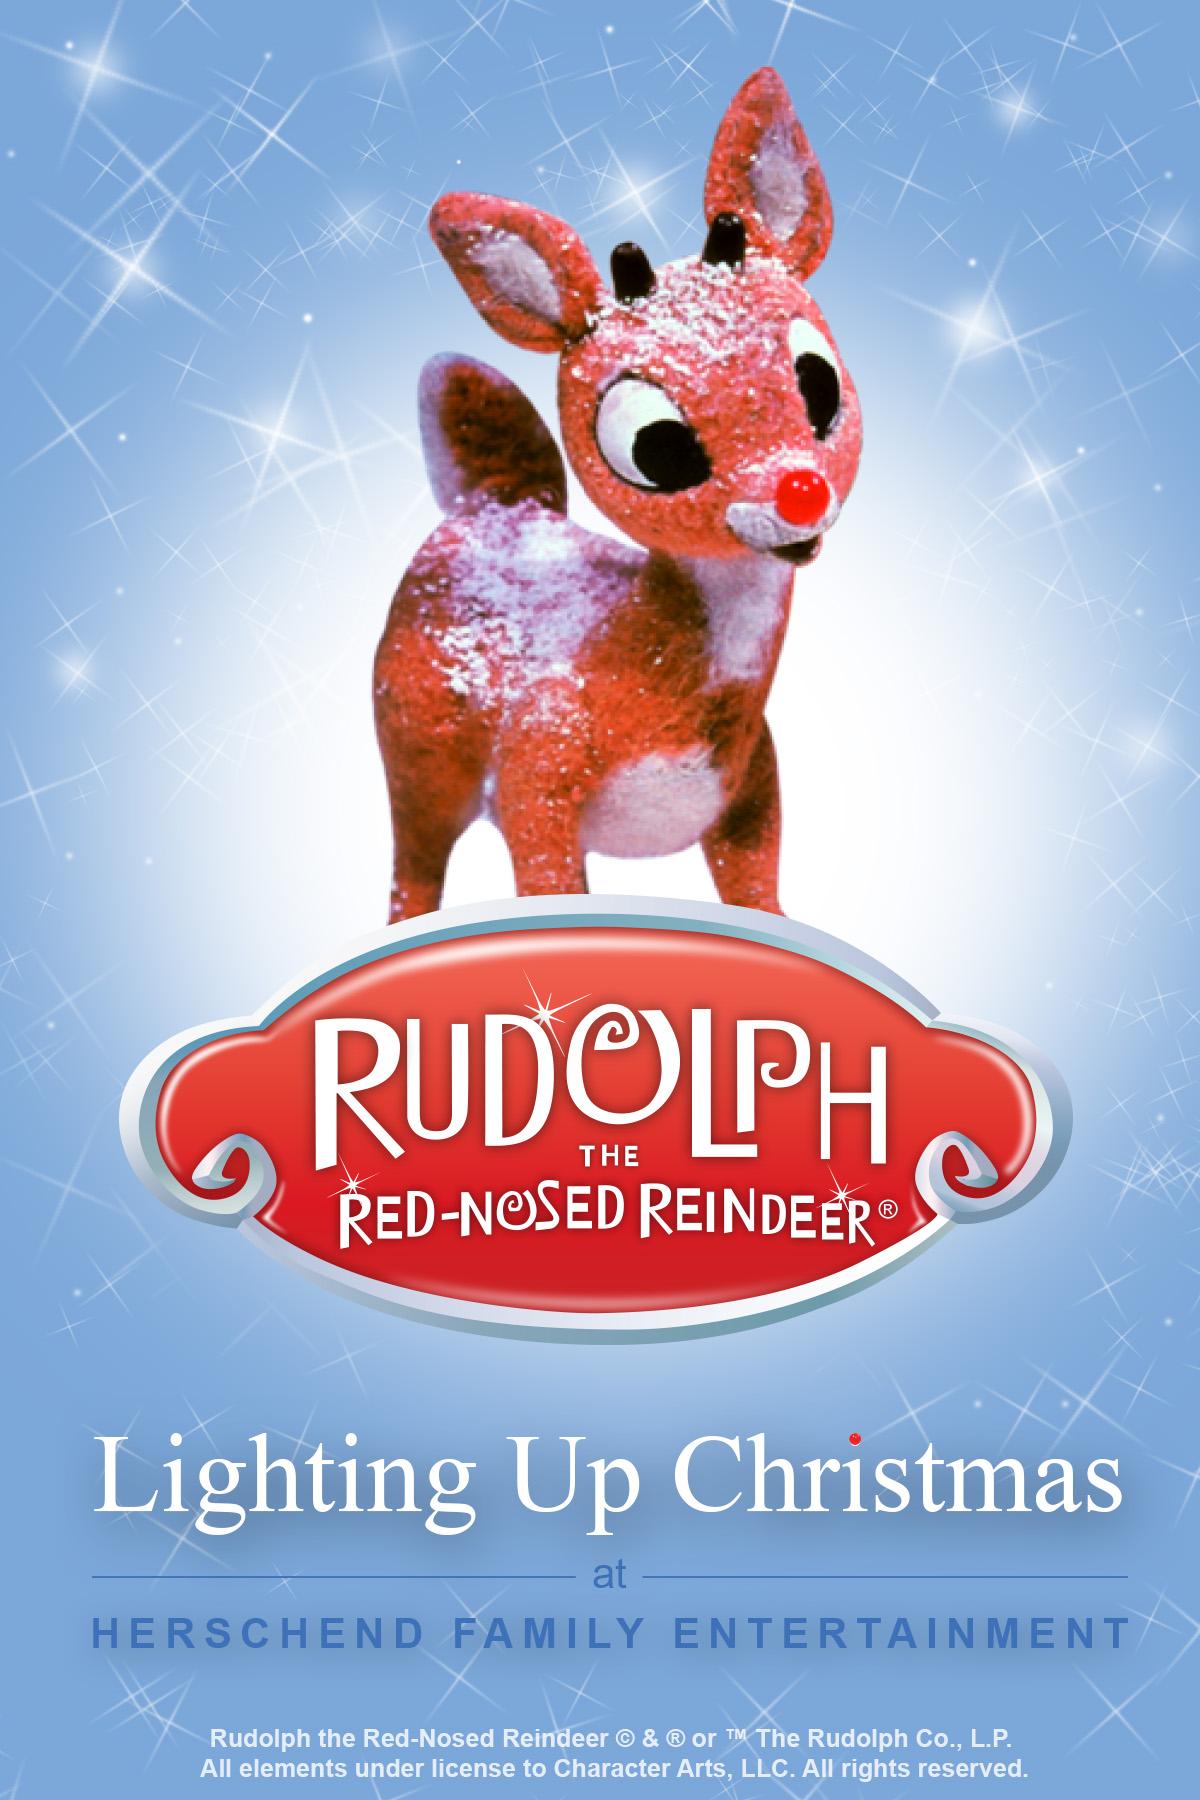 herschend parks to feature rudolph the rednosed reindeer